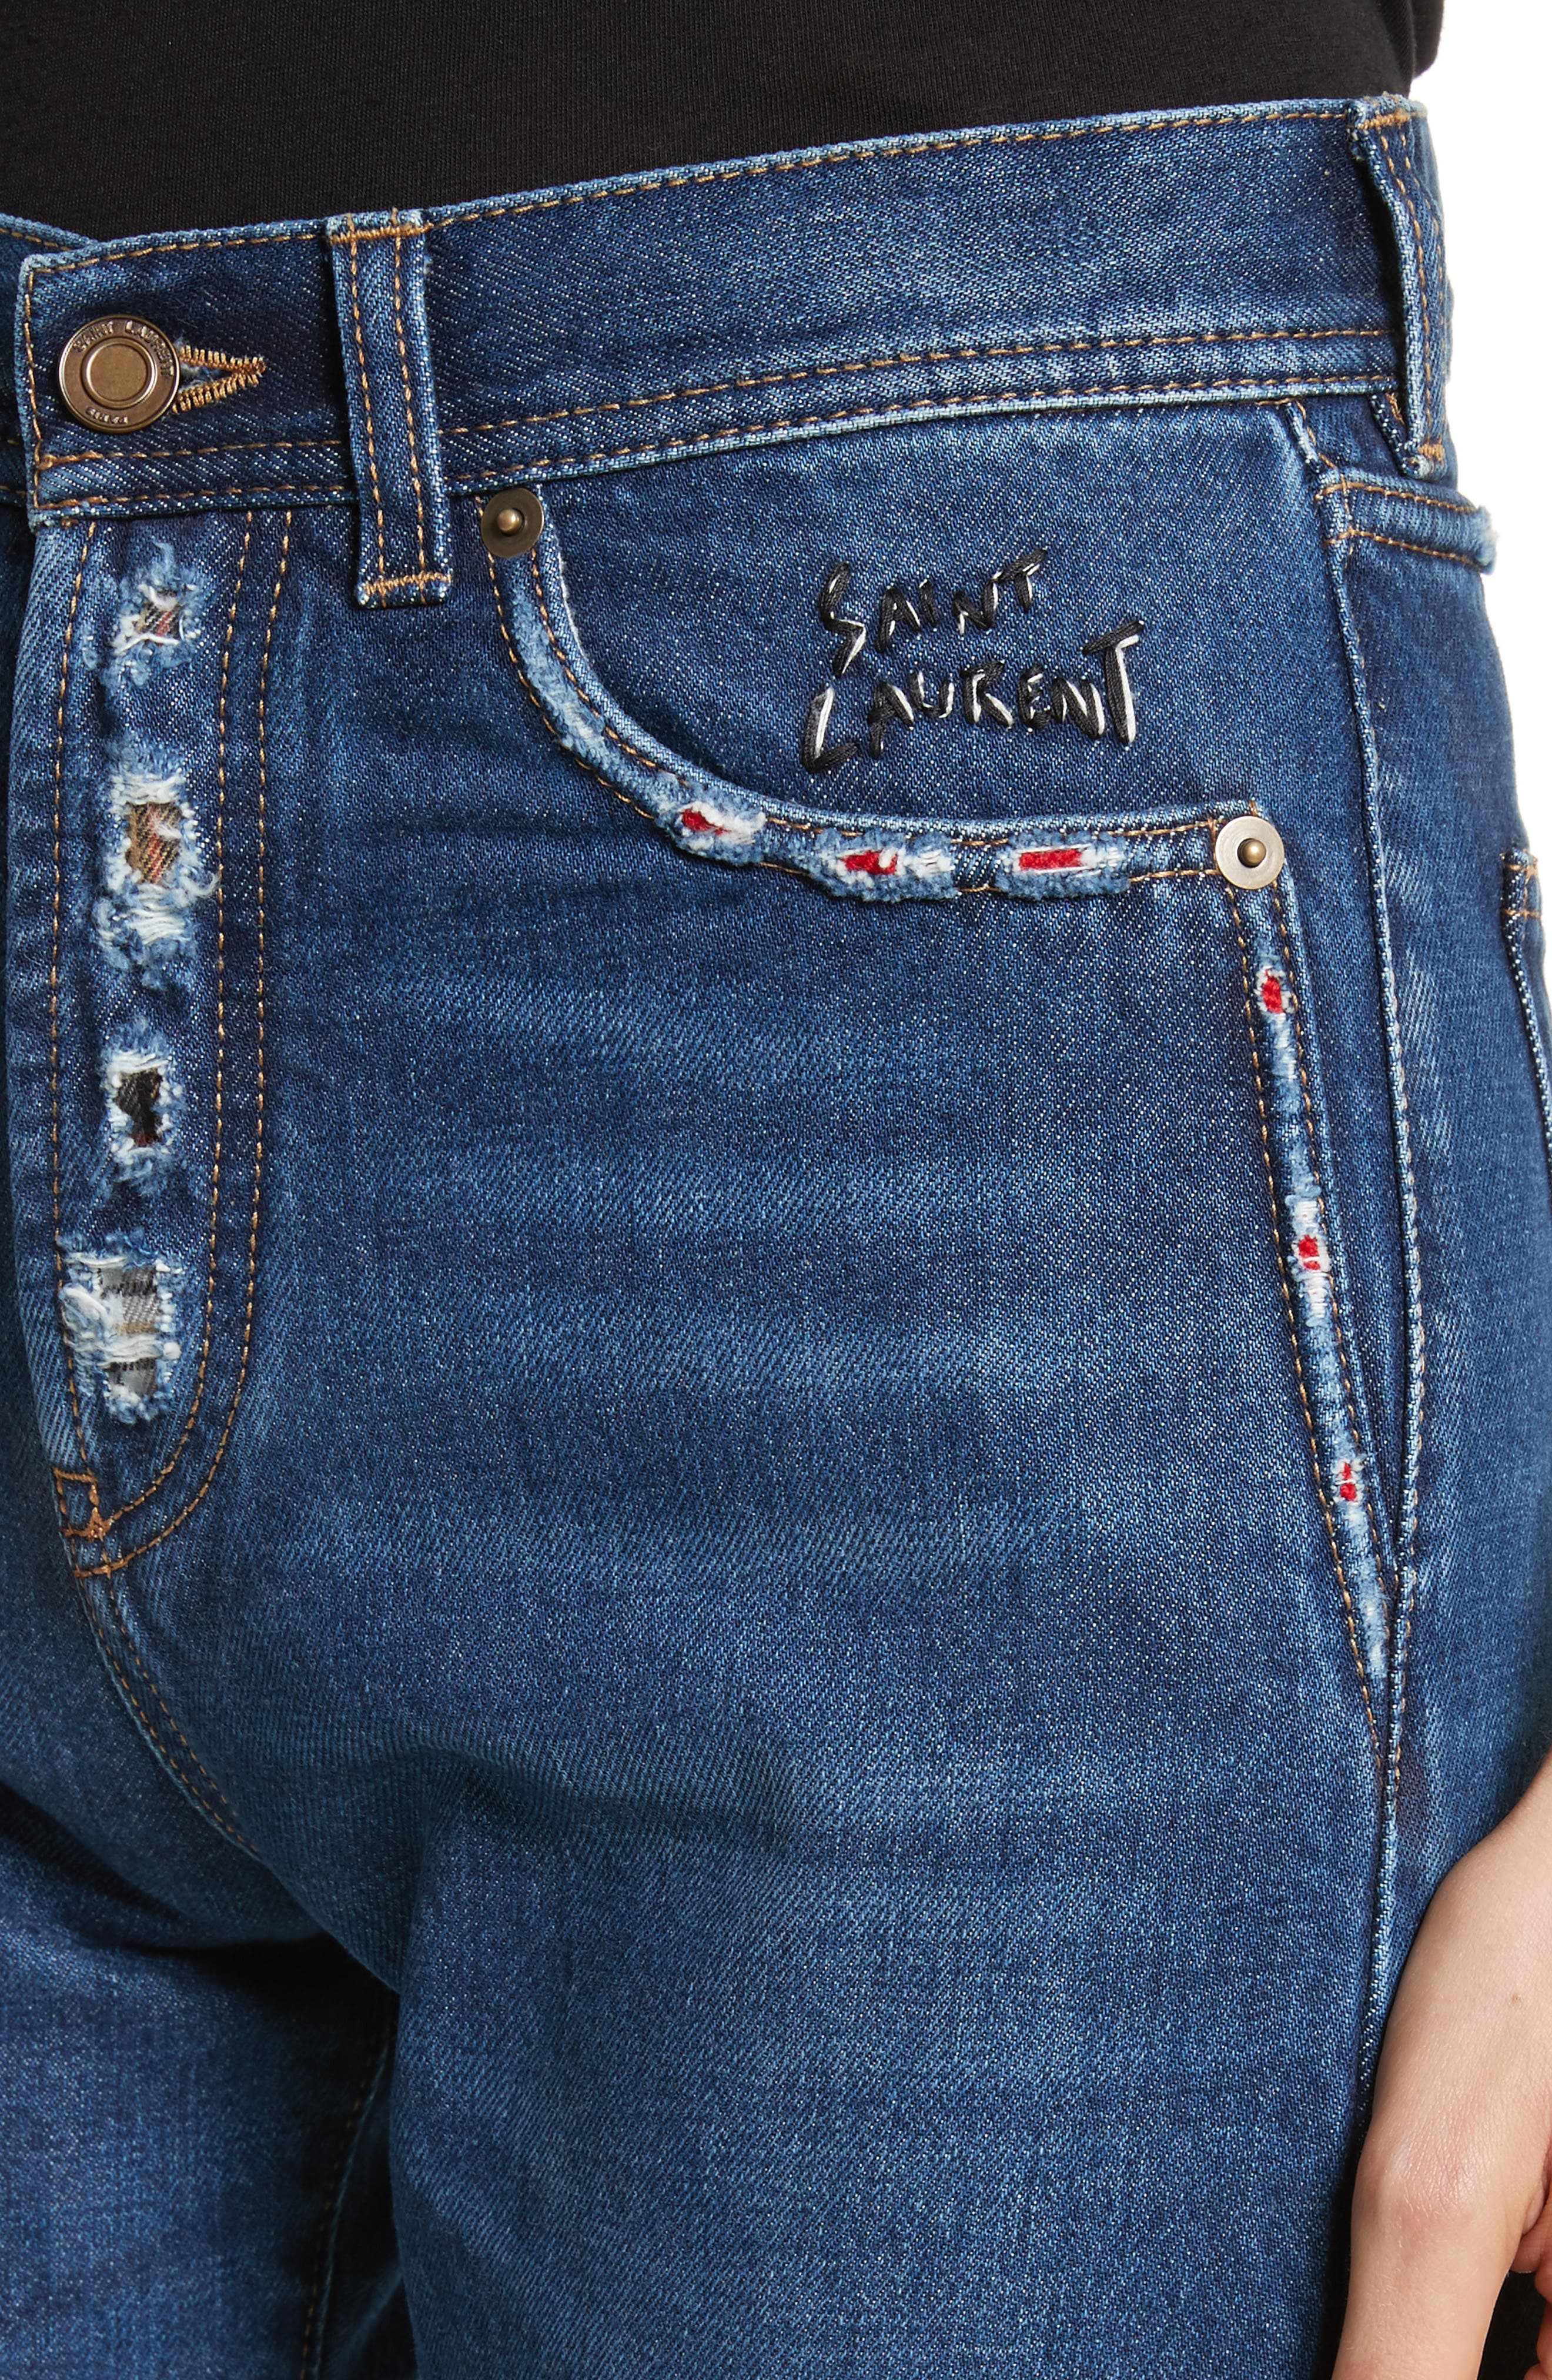 Alternate Image 4  - Saint Laurent Embroidered Jeans (Deep Dark Blue)